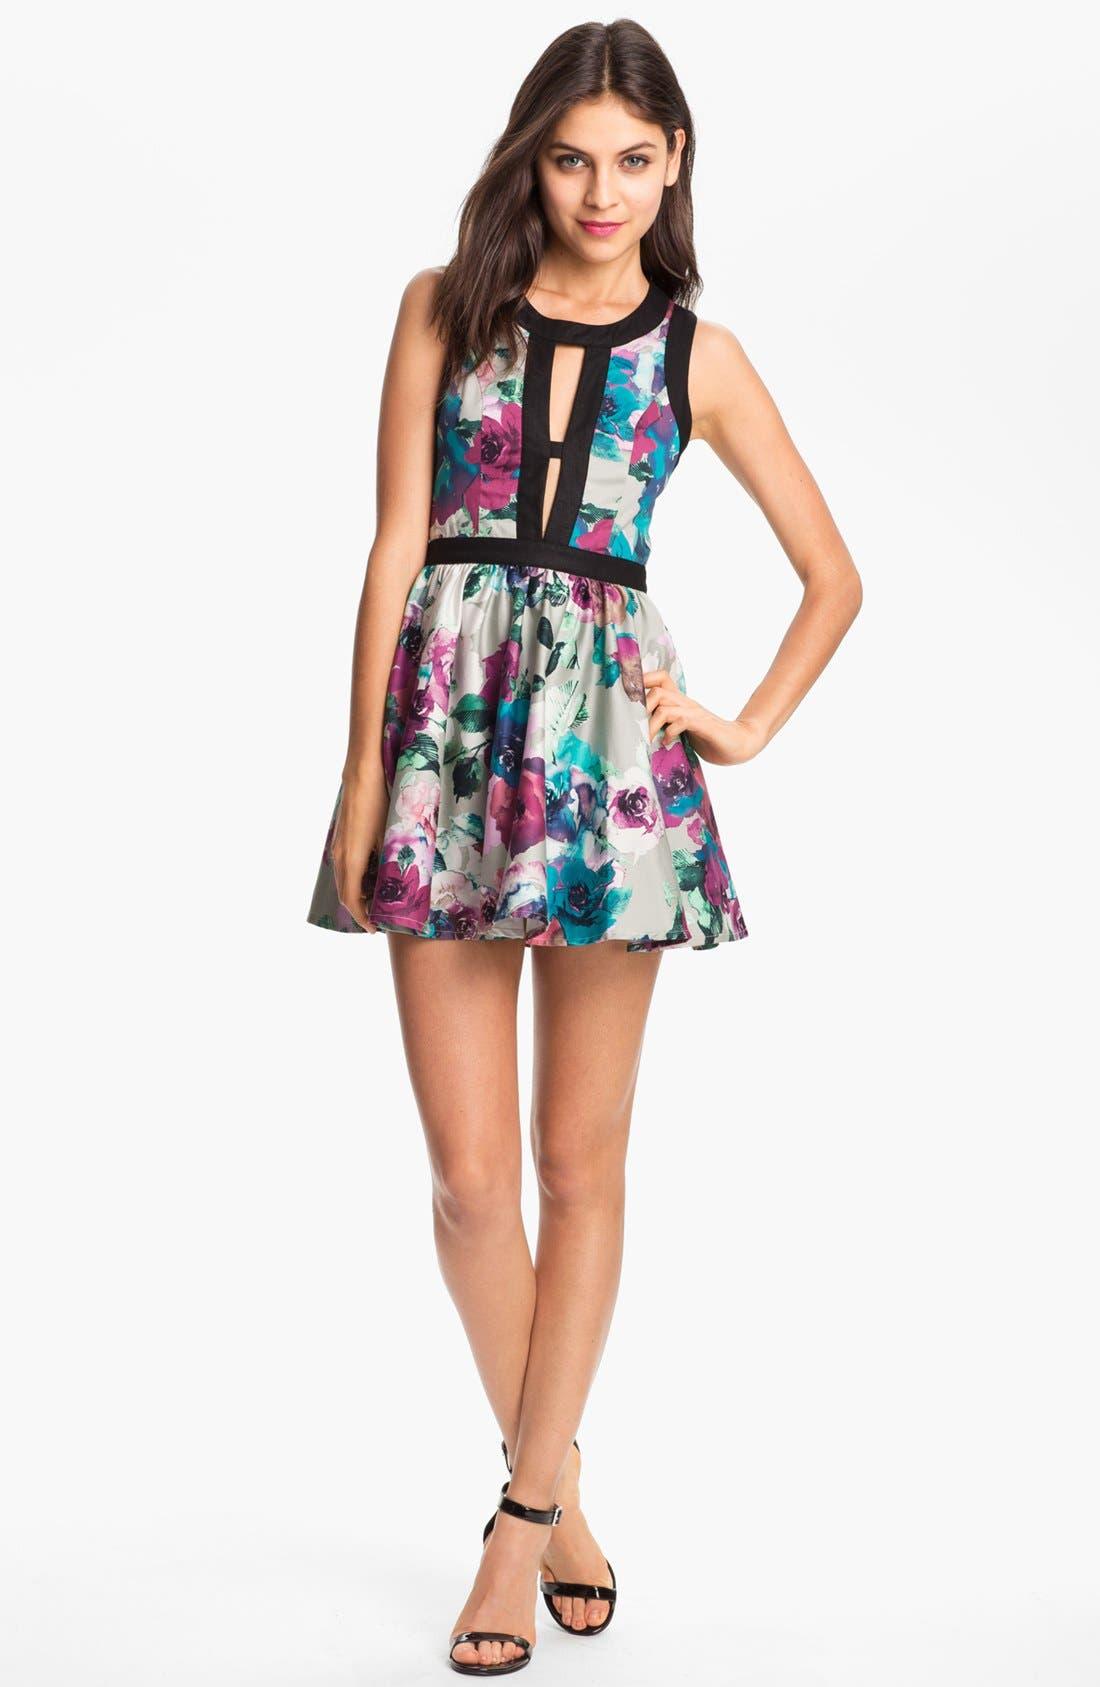 Main Image - Keepsake the Label 'Day Dream' Print Fit & Flare Dress